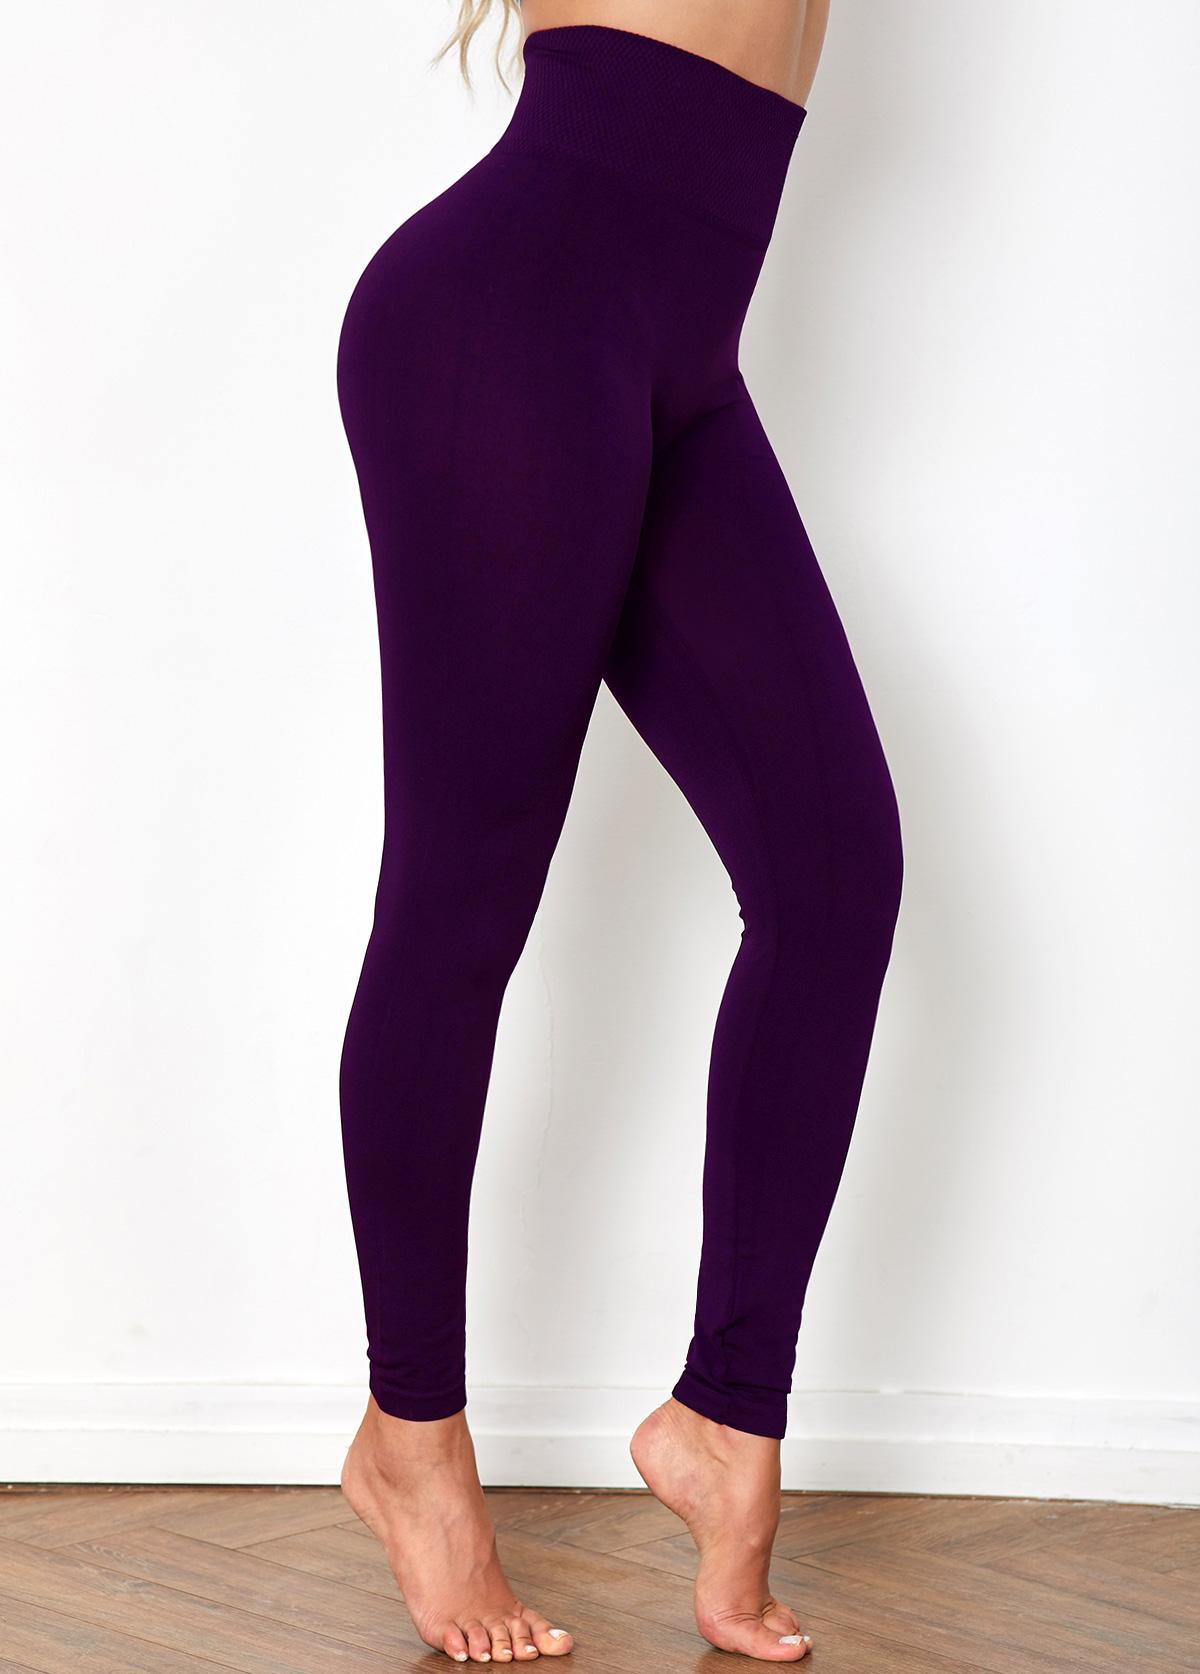 High Waist Super Elastic Legging Pants